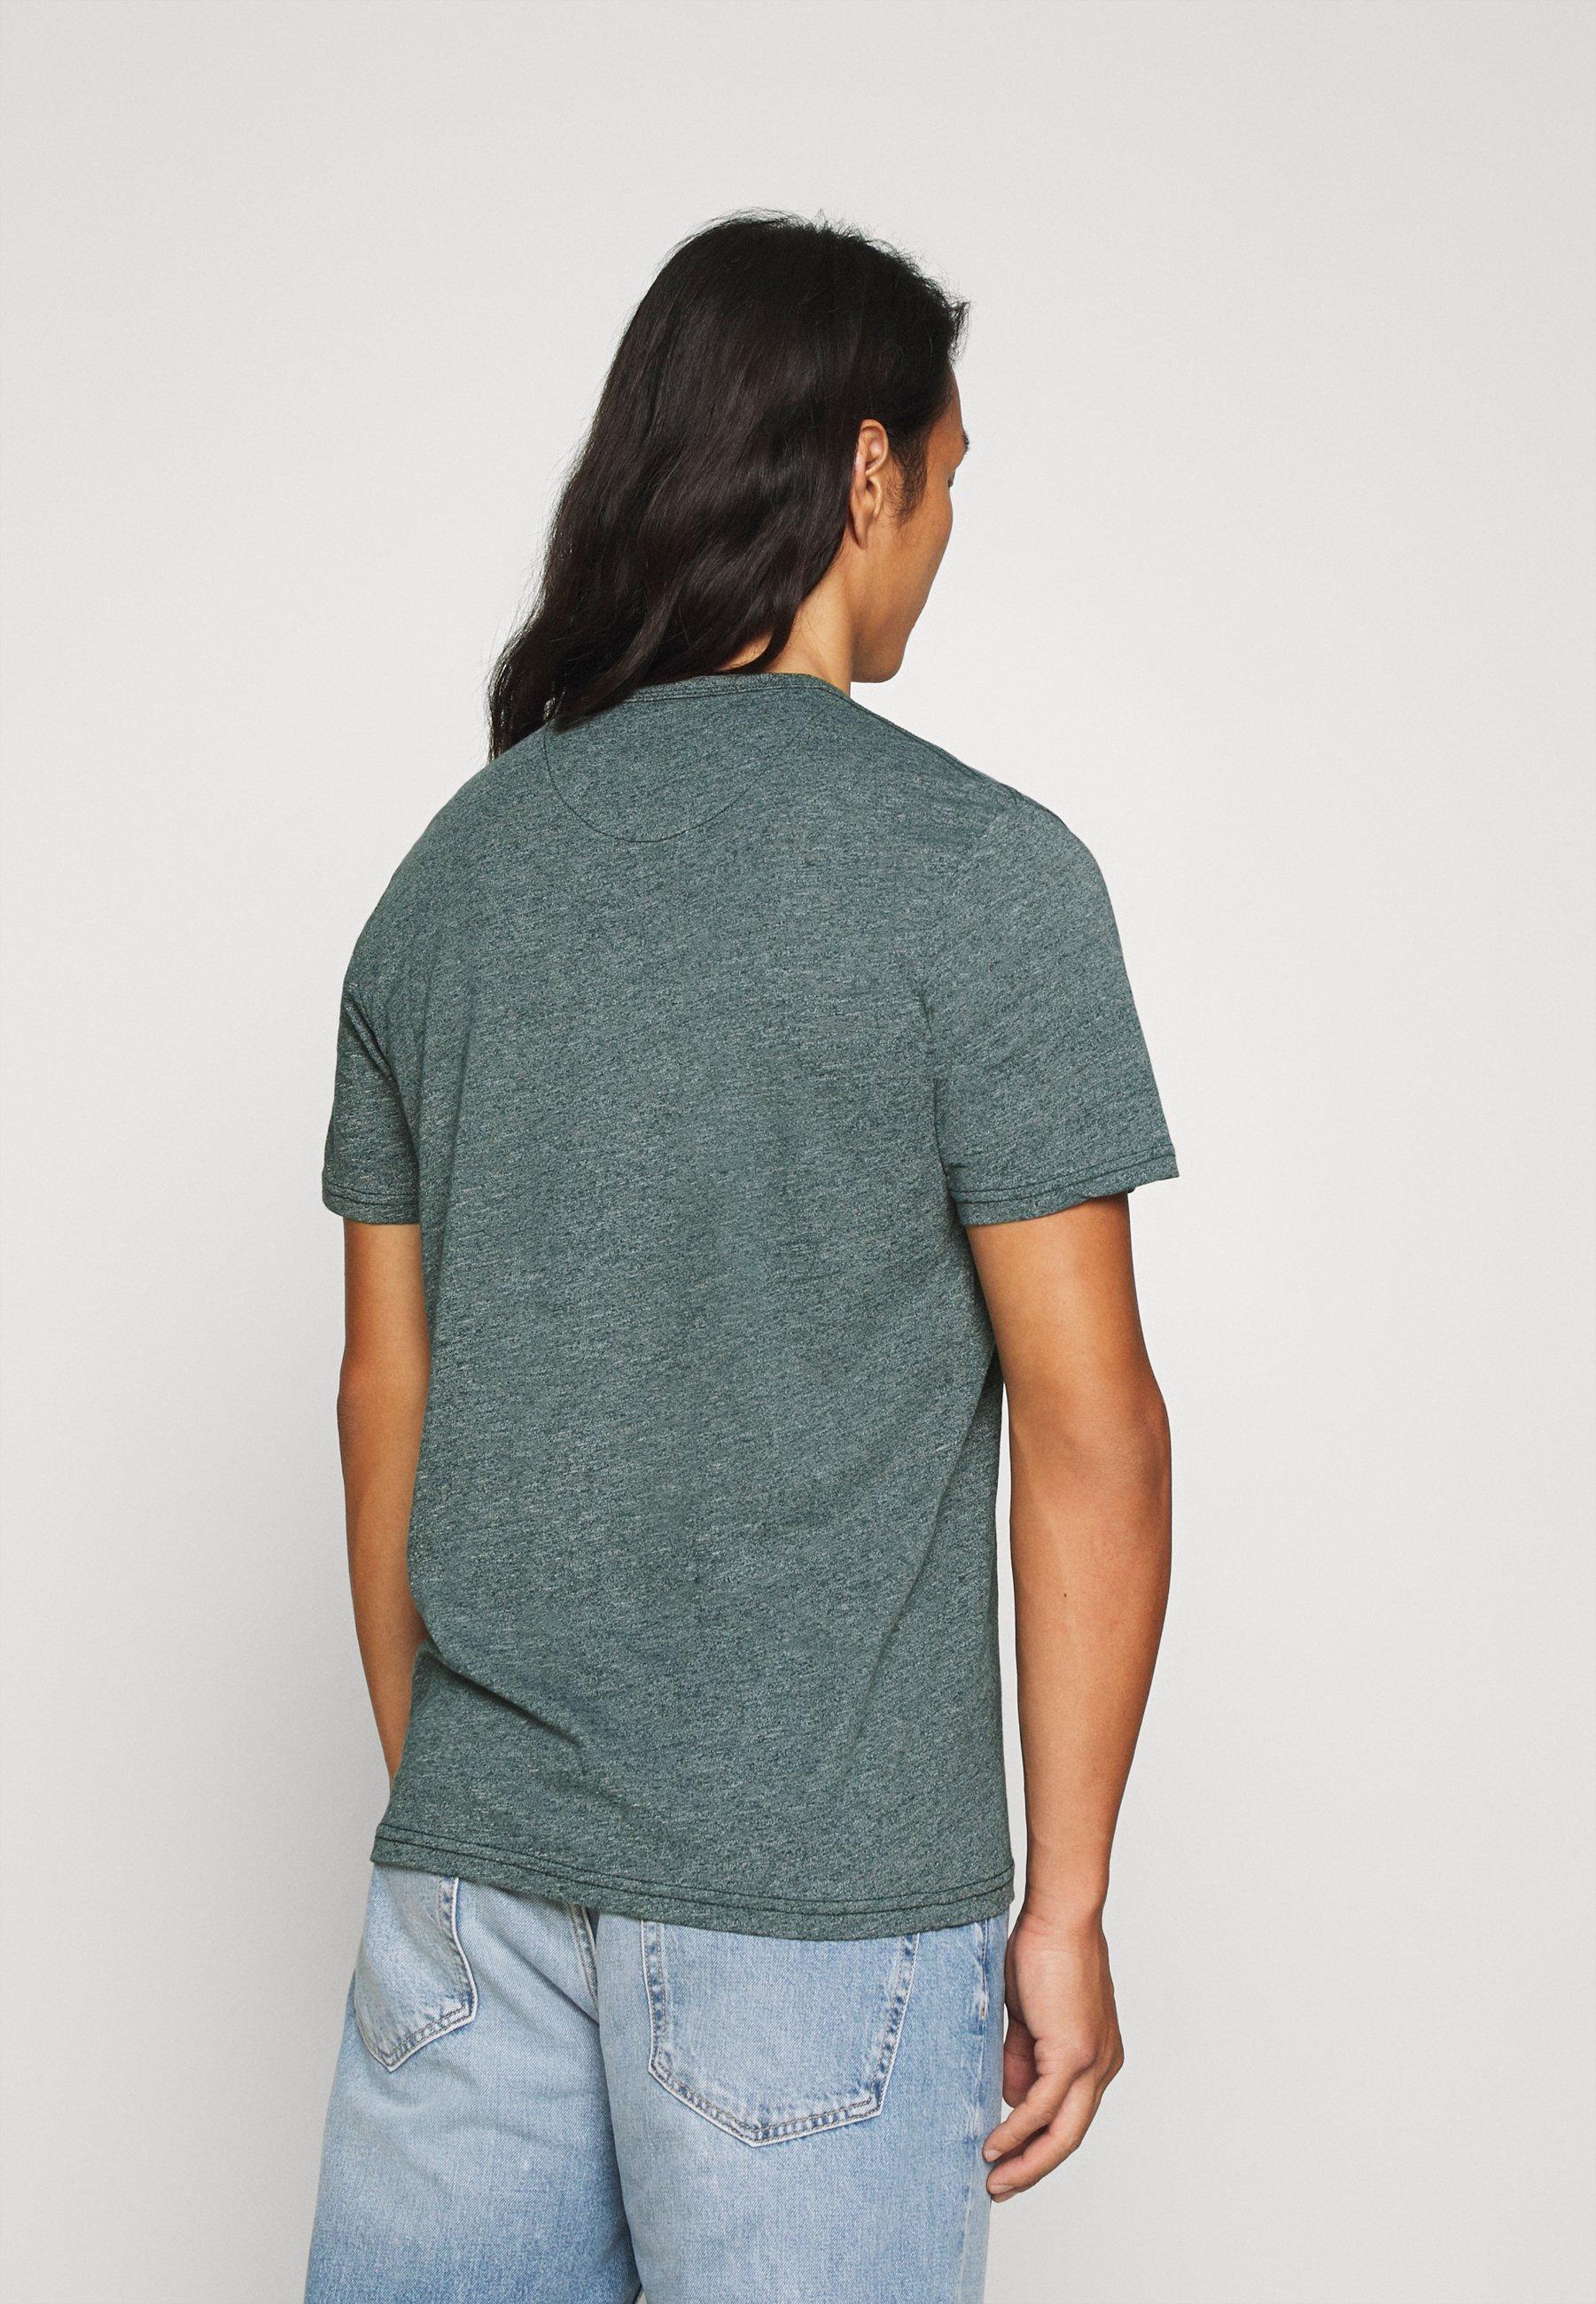 TOM TAILOR COSY GRINDLE  - Basic T-shirt - stroke green bek6T